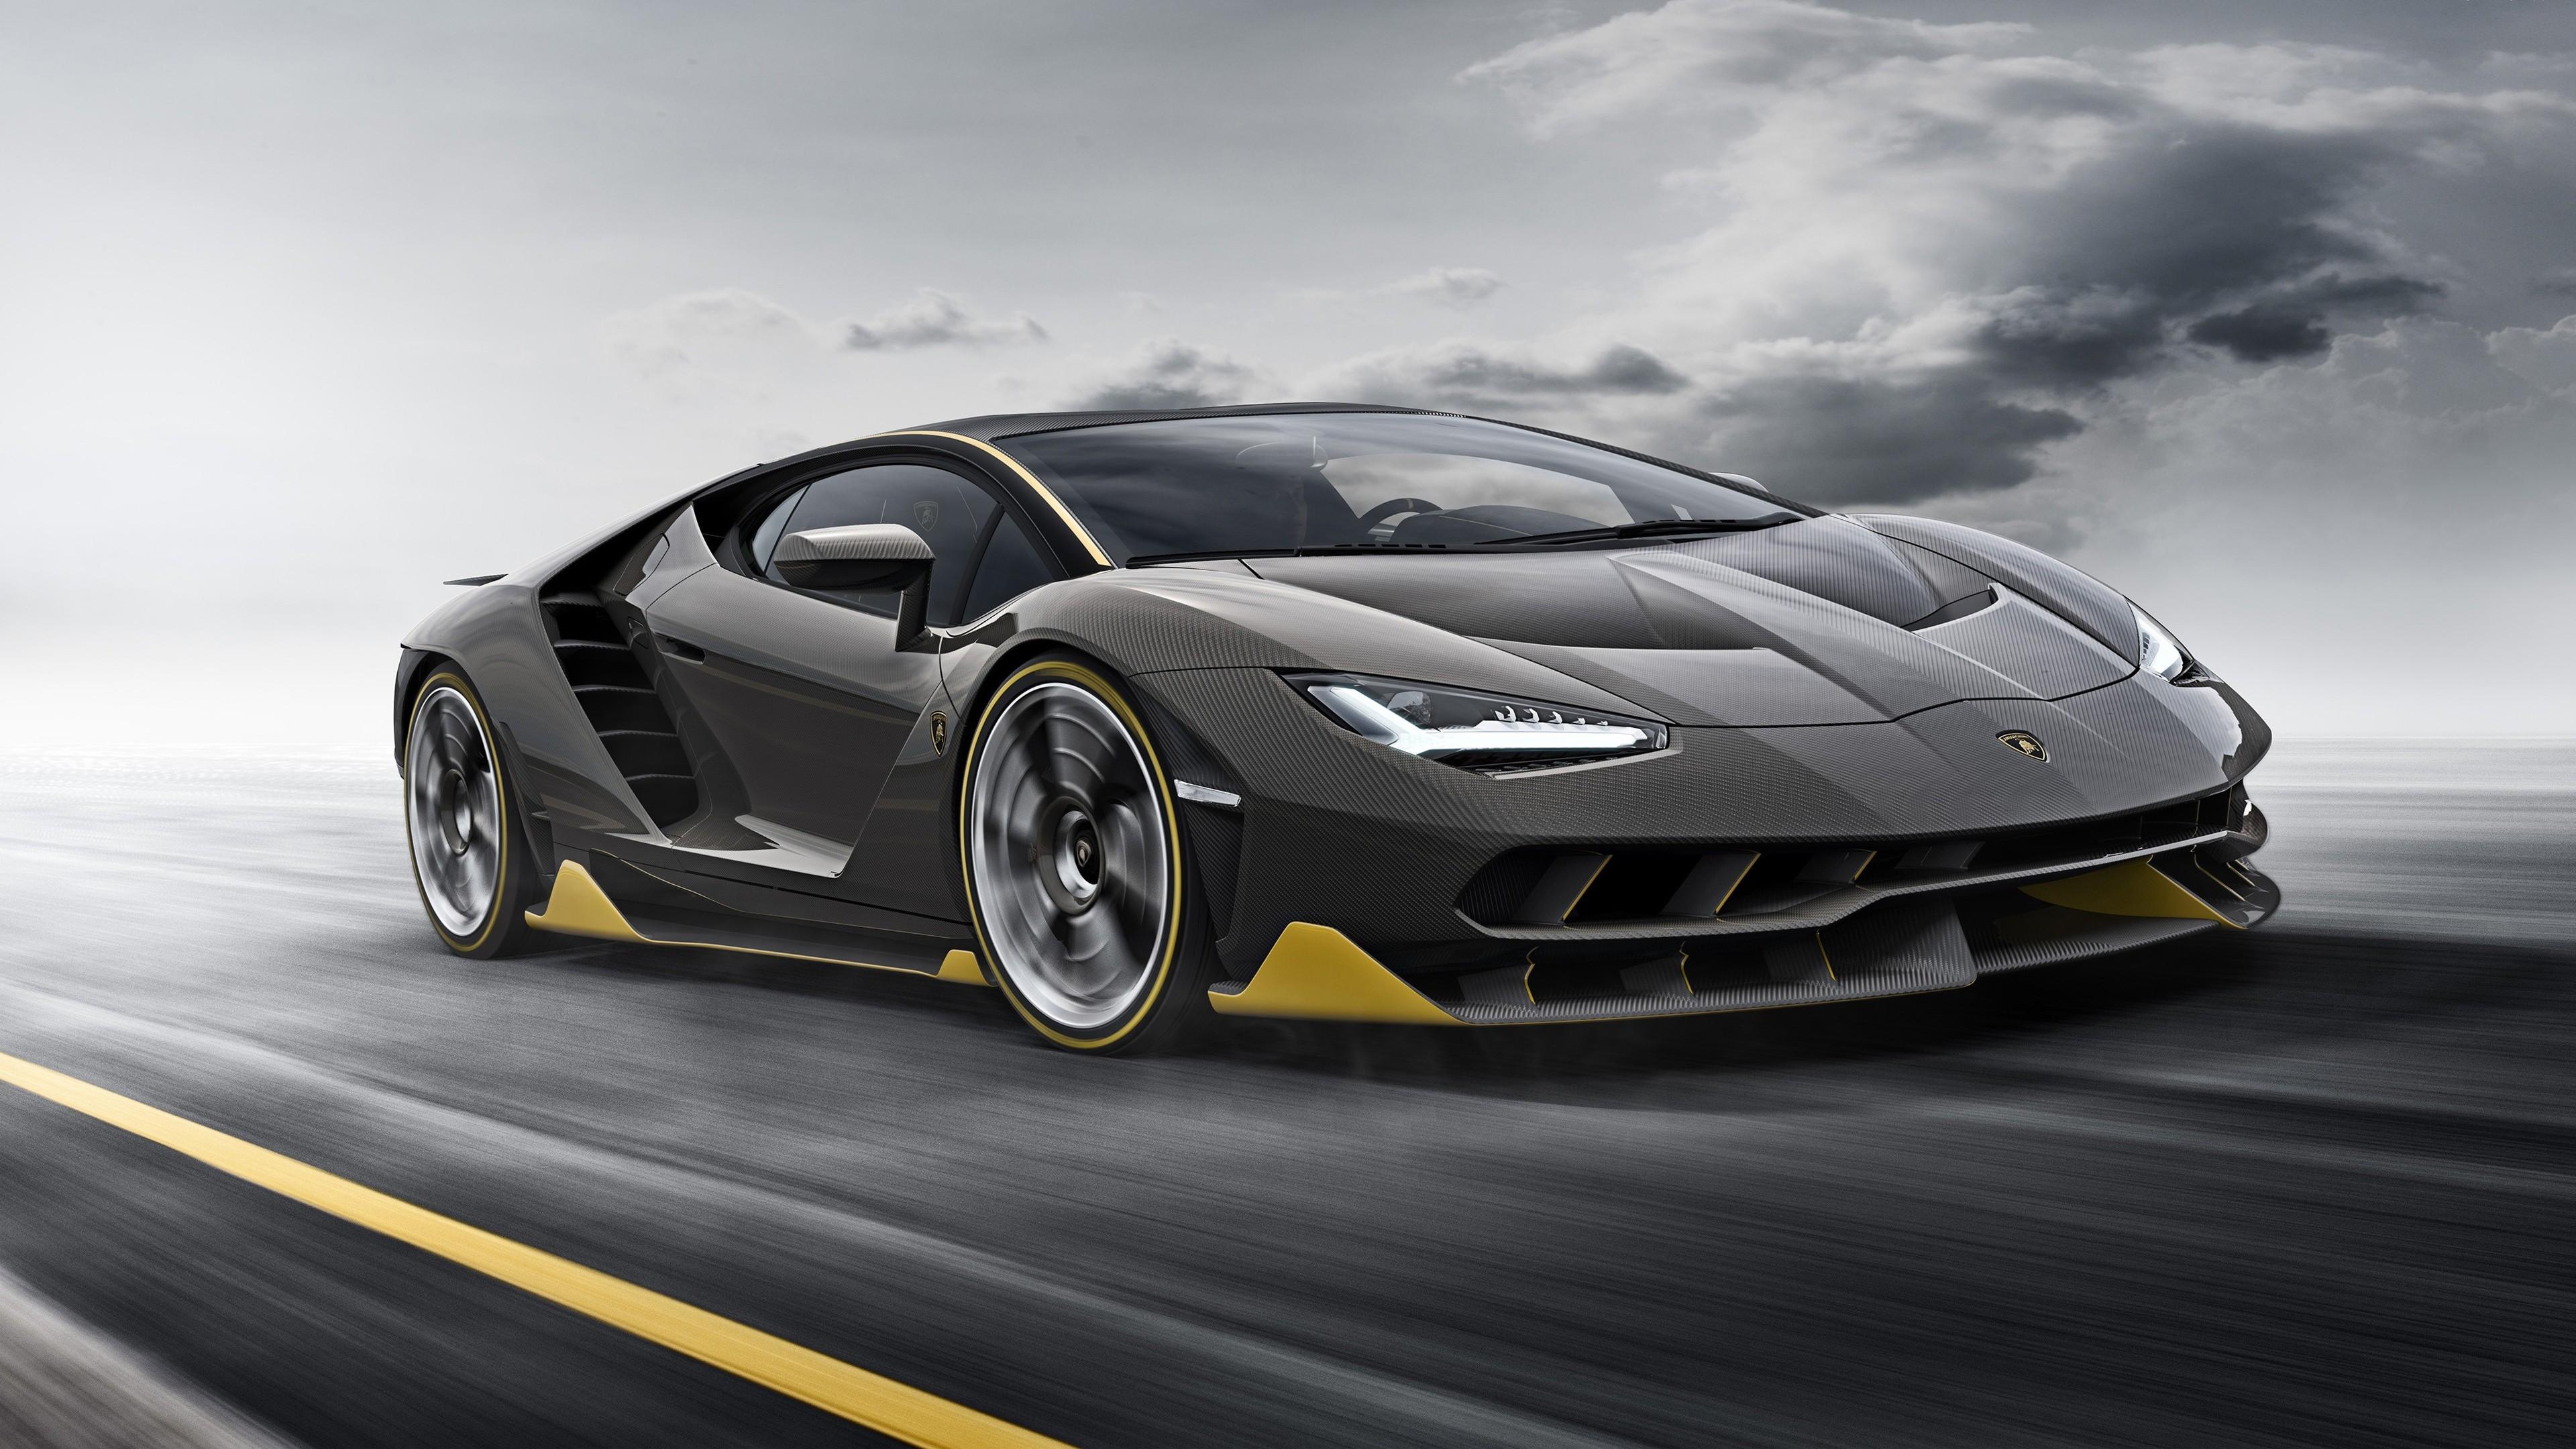 Wallpaper Video Games Lamborghini Aventador Sports Car